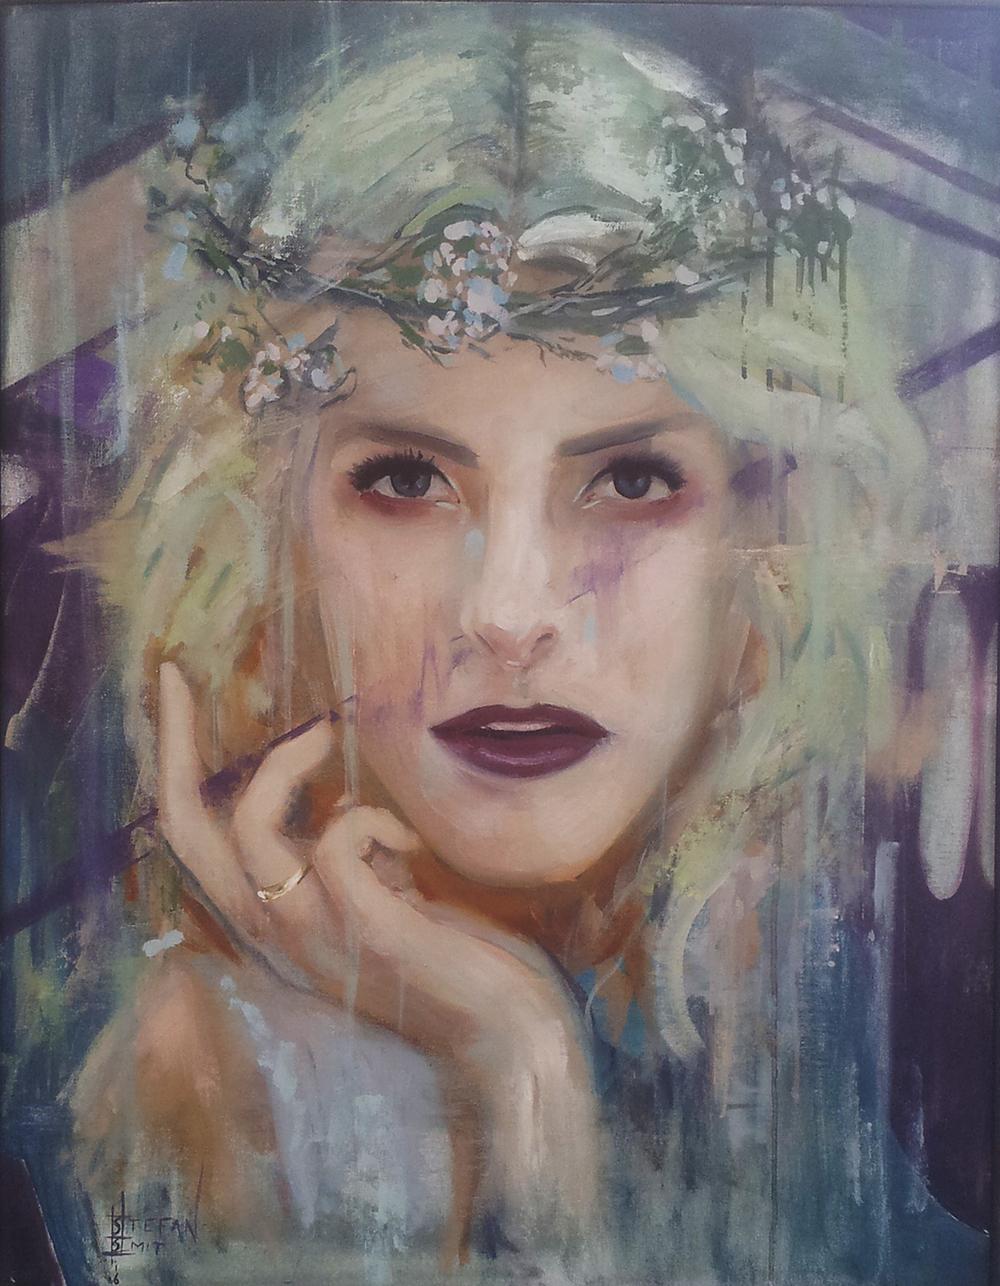 Stefan Smit  'Streets Find Light'  Oil on canvas  71 x 56 cm